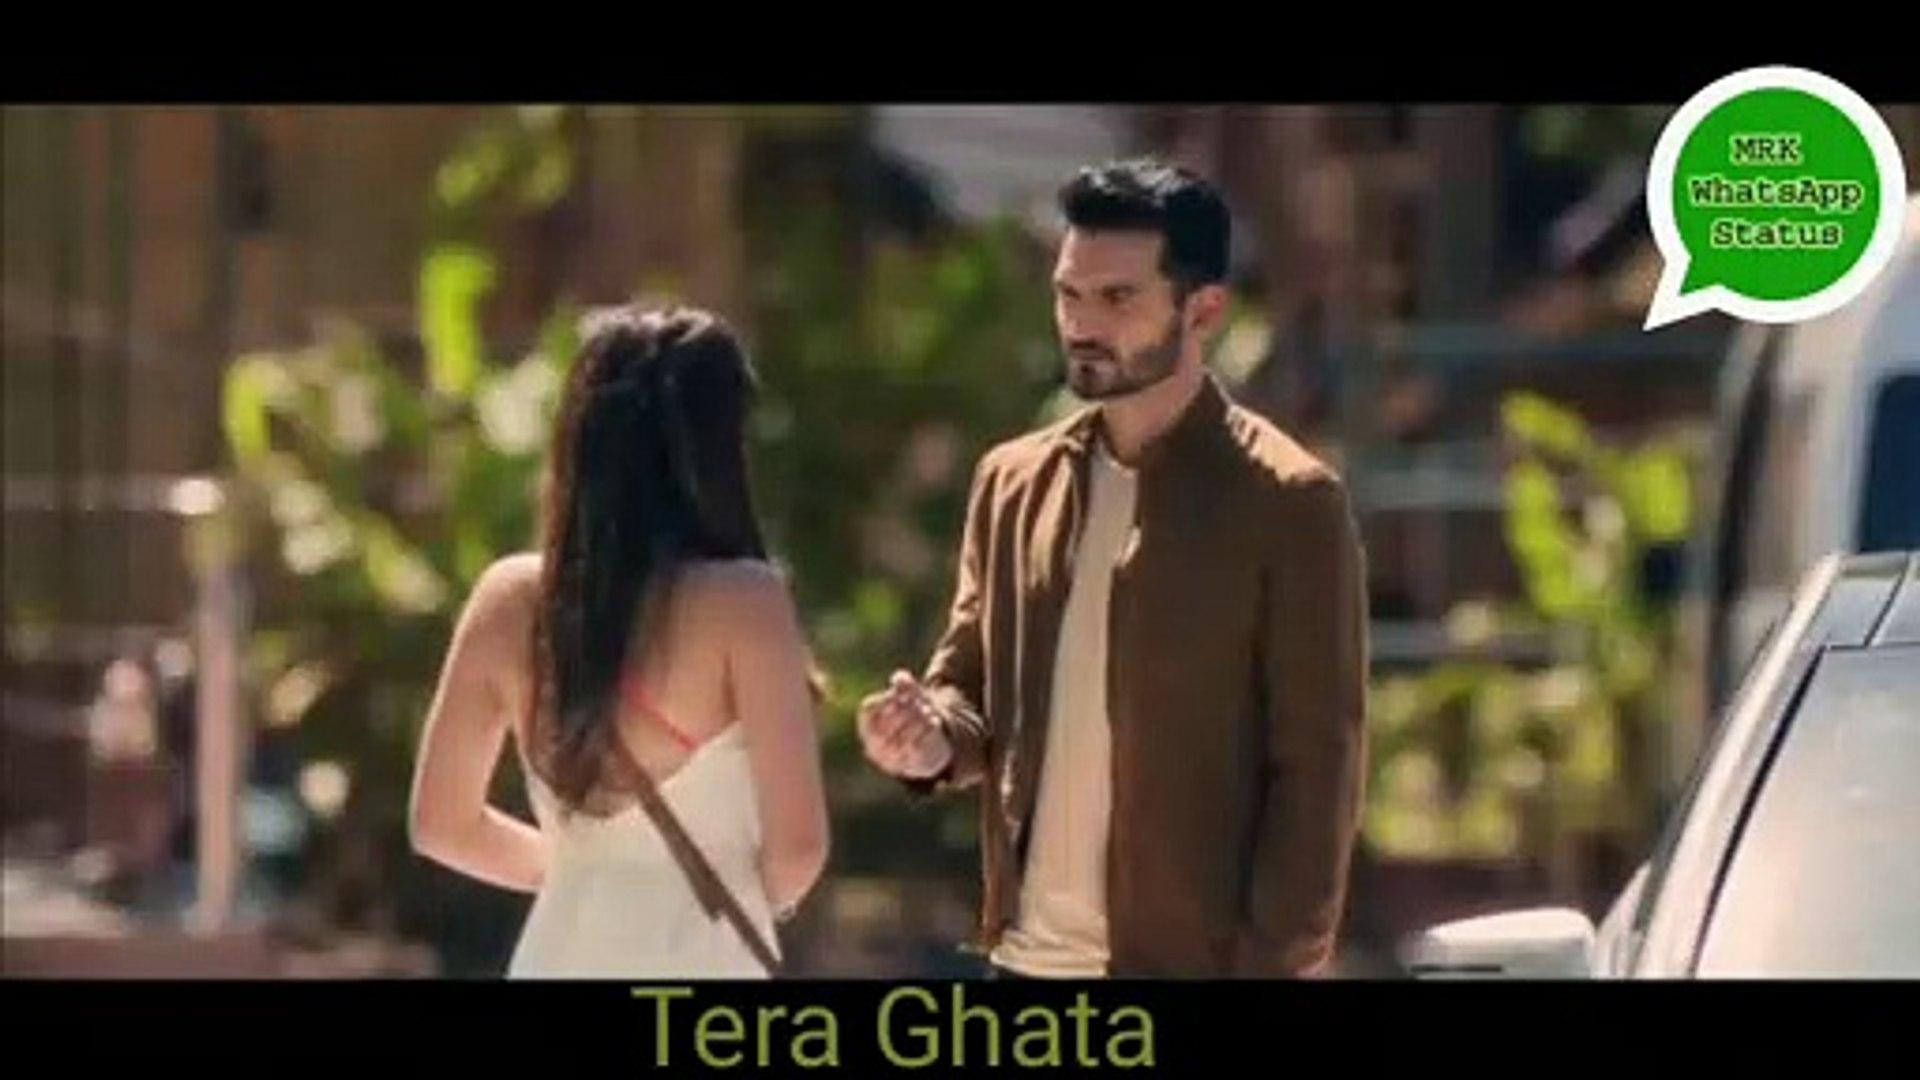 Tera Ghata | Heart Status | WhatsApp Status